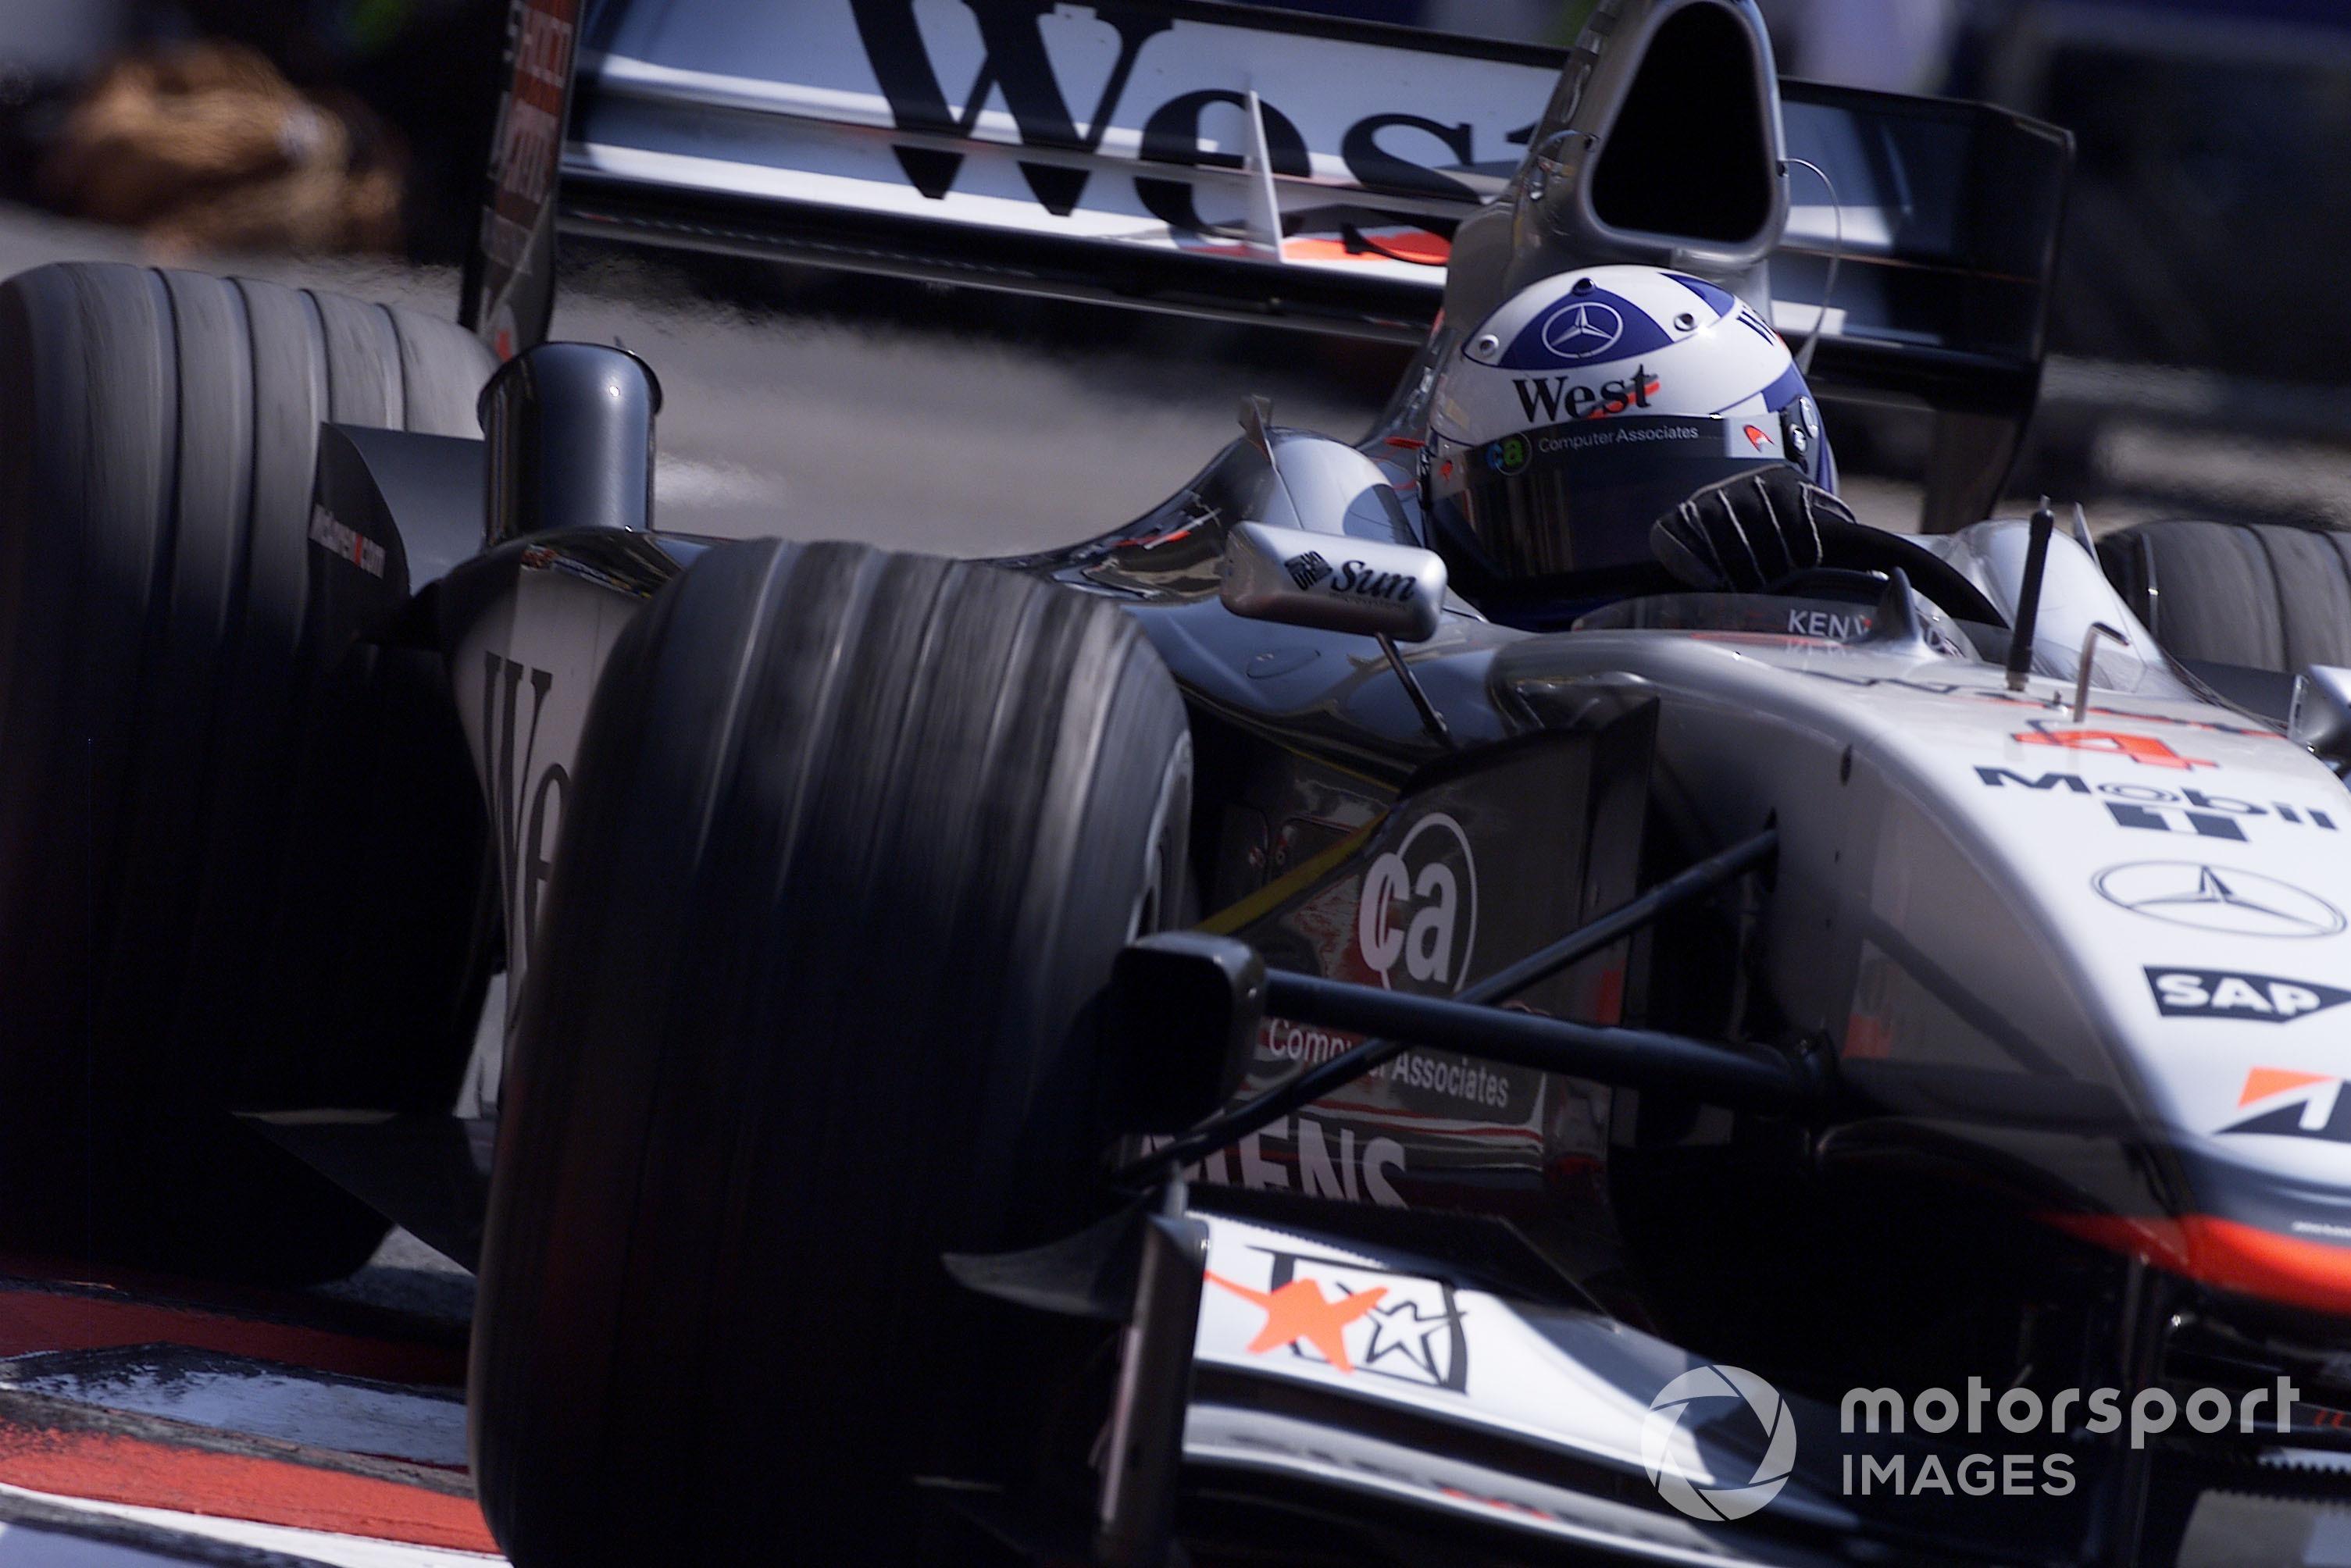 David Coulthard (McLaren MP4/16 Mercedes), 2001 Monaco GP